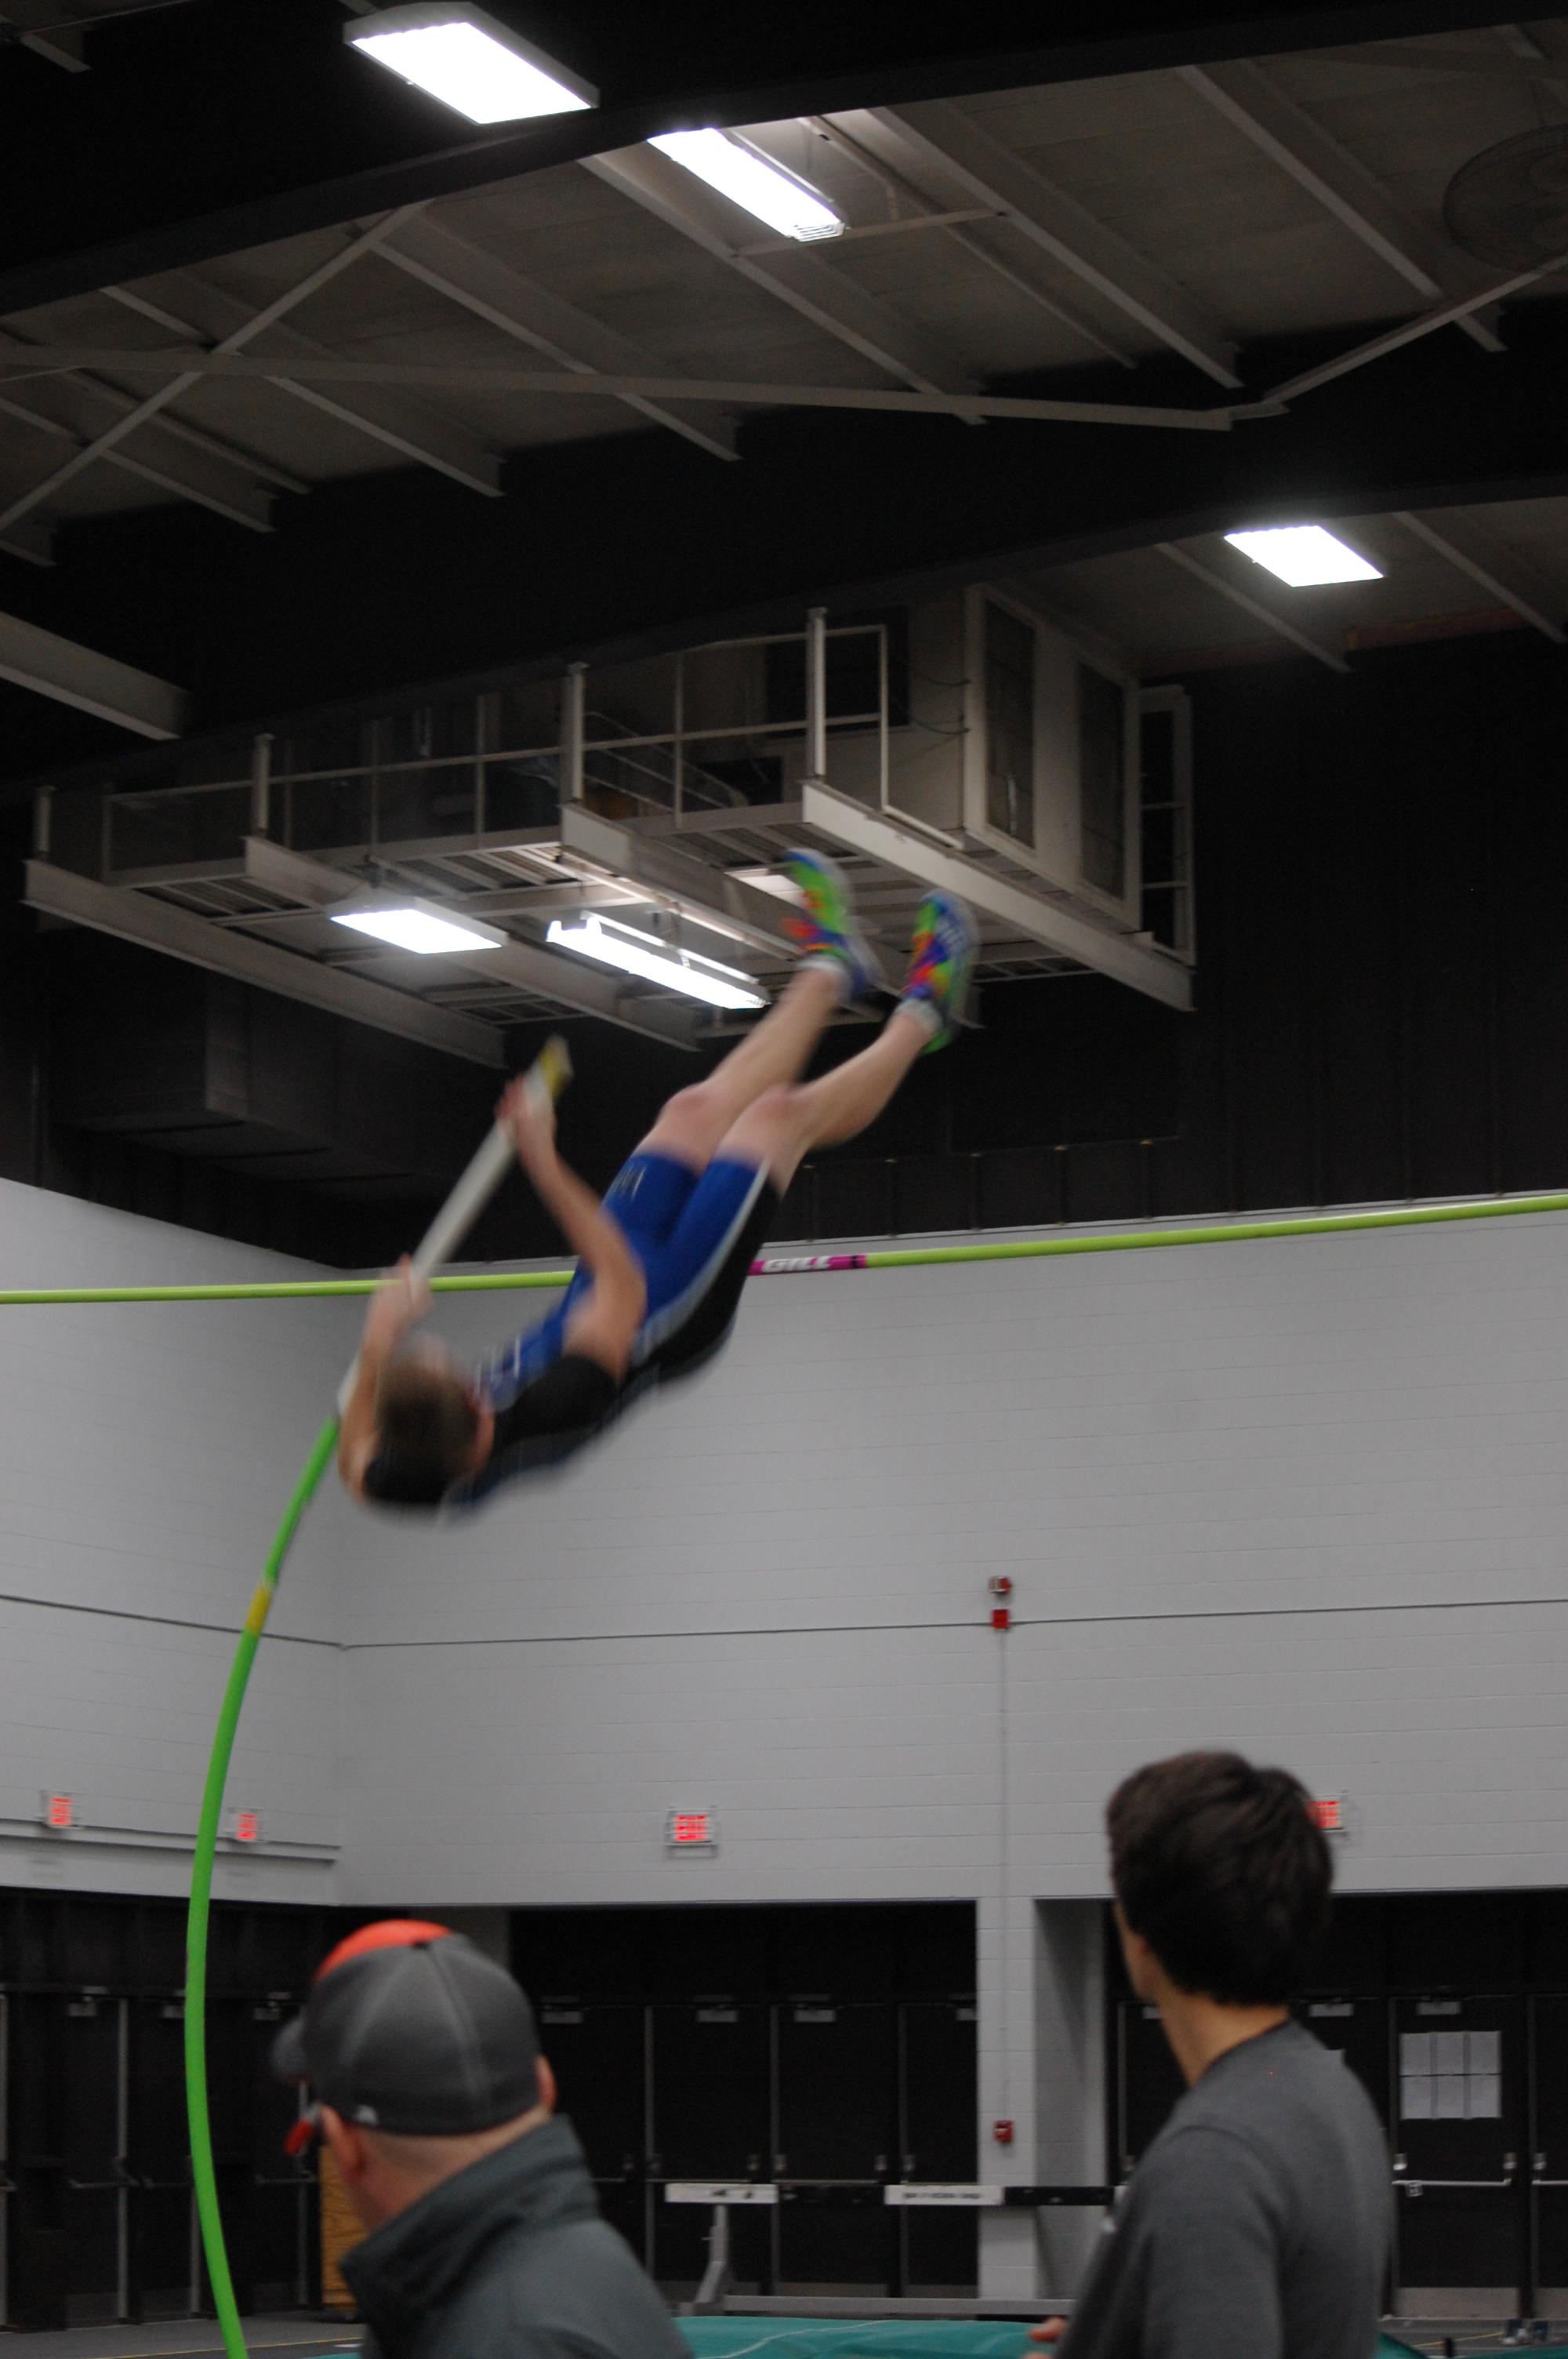 Joe Vils executes perfect pole vault form.